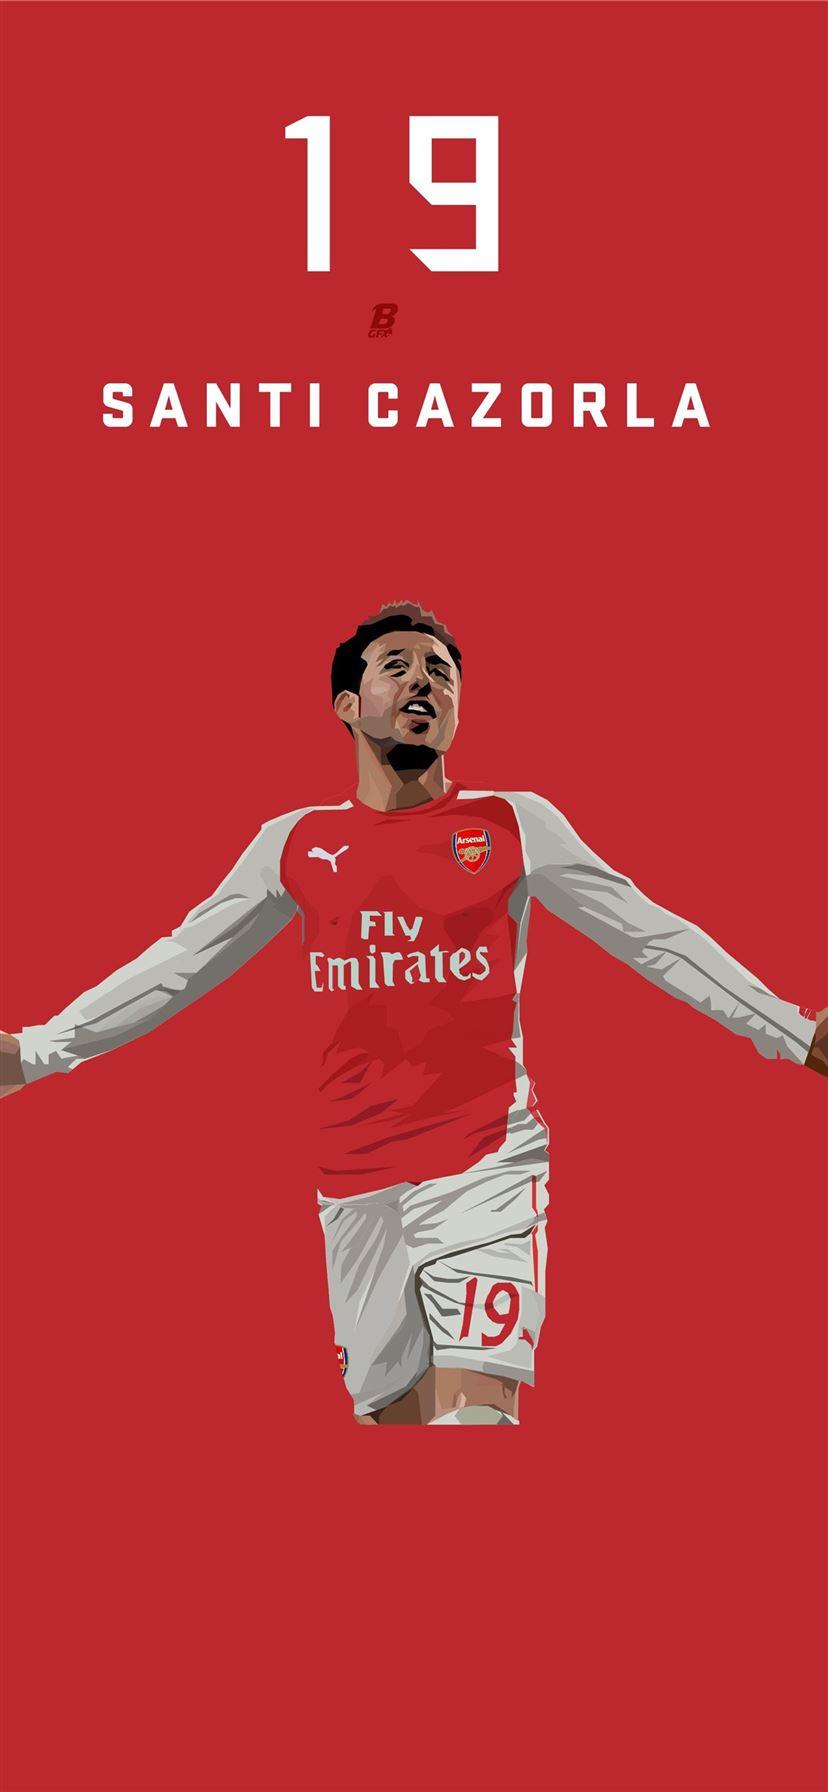 Santi Cazorla 3 Arsenal Iphone 11 Wallpapers Free Download